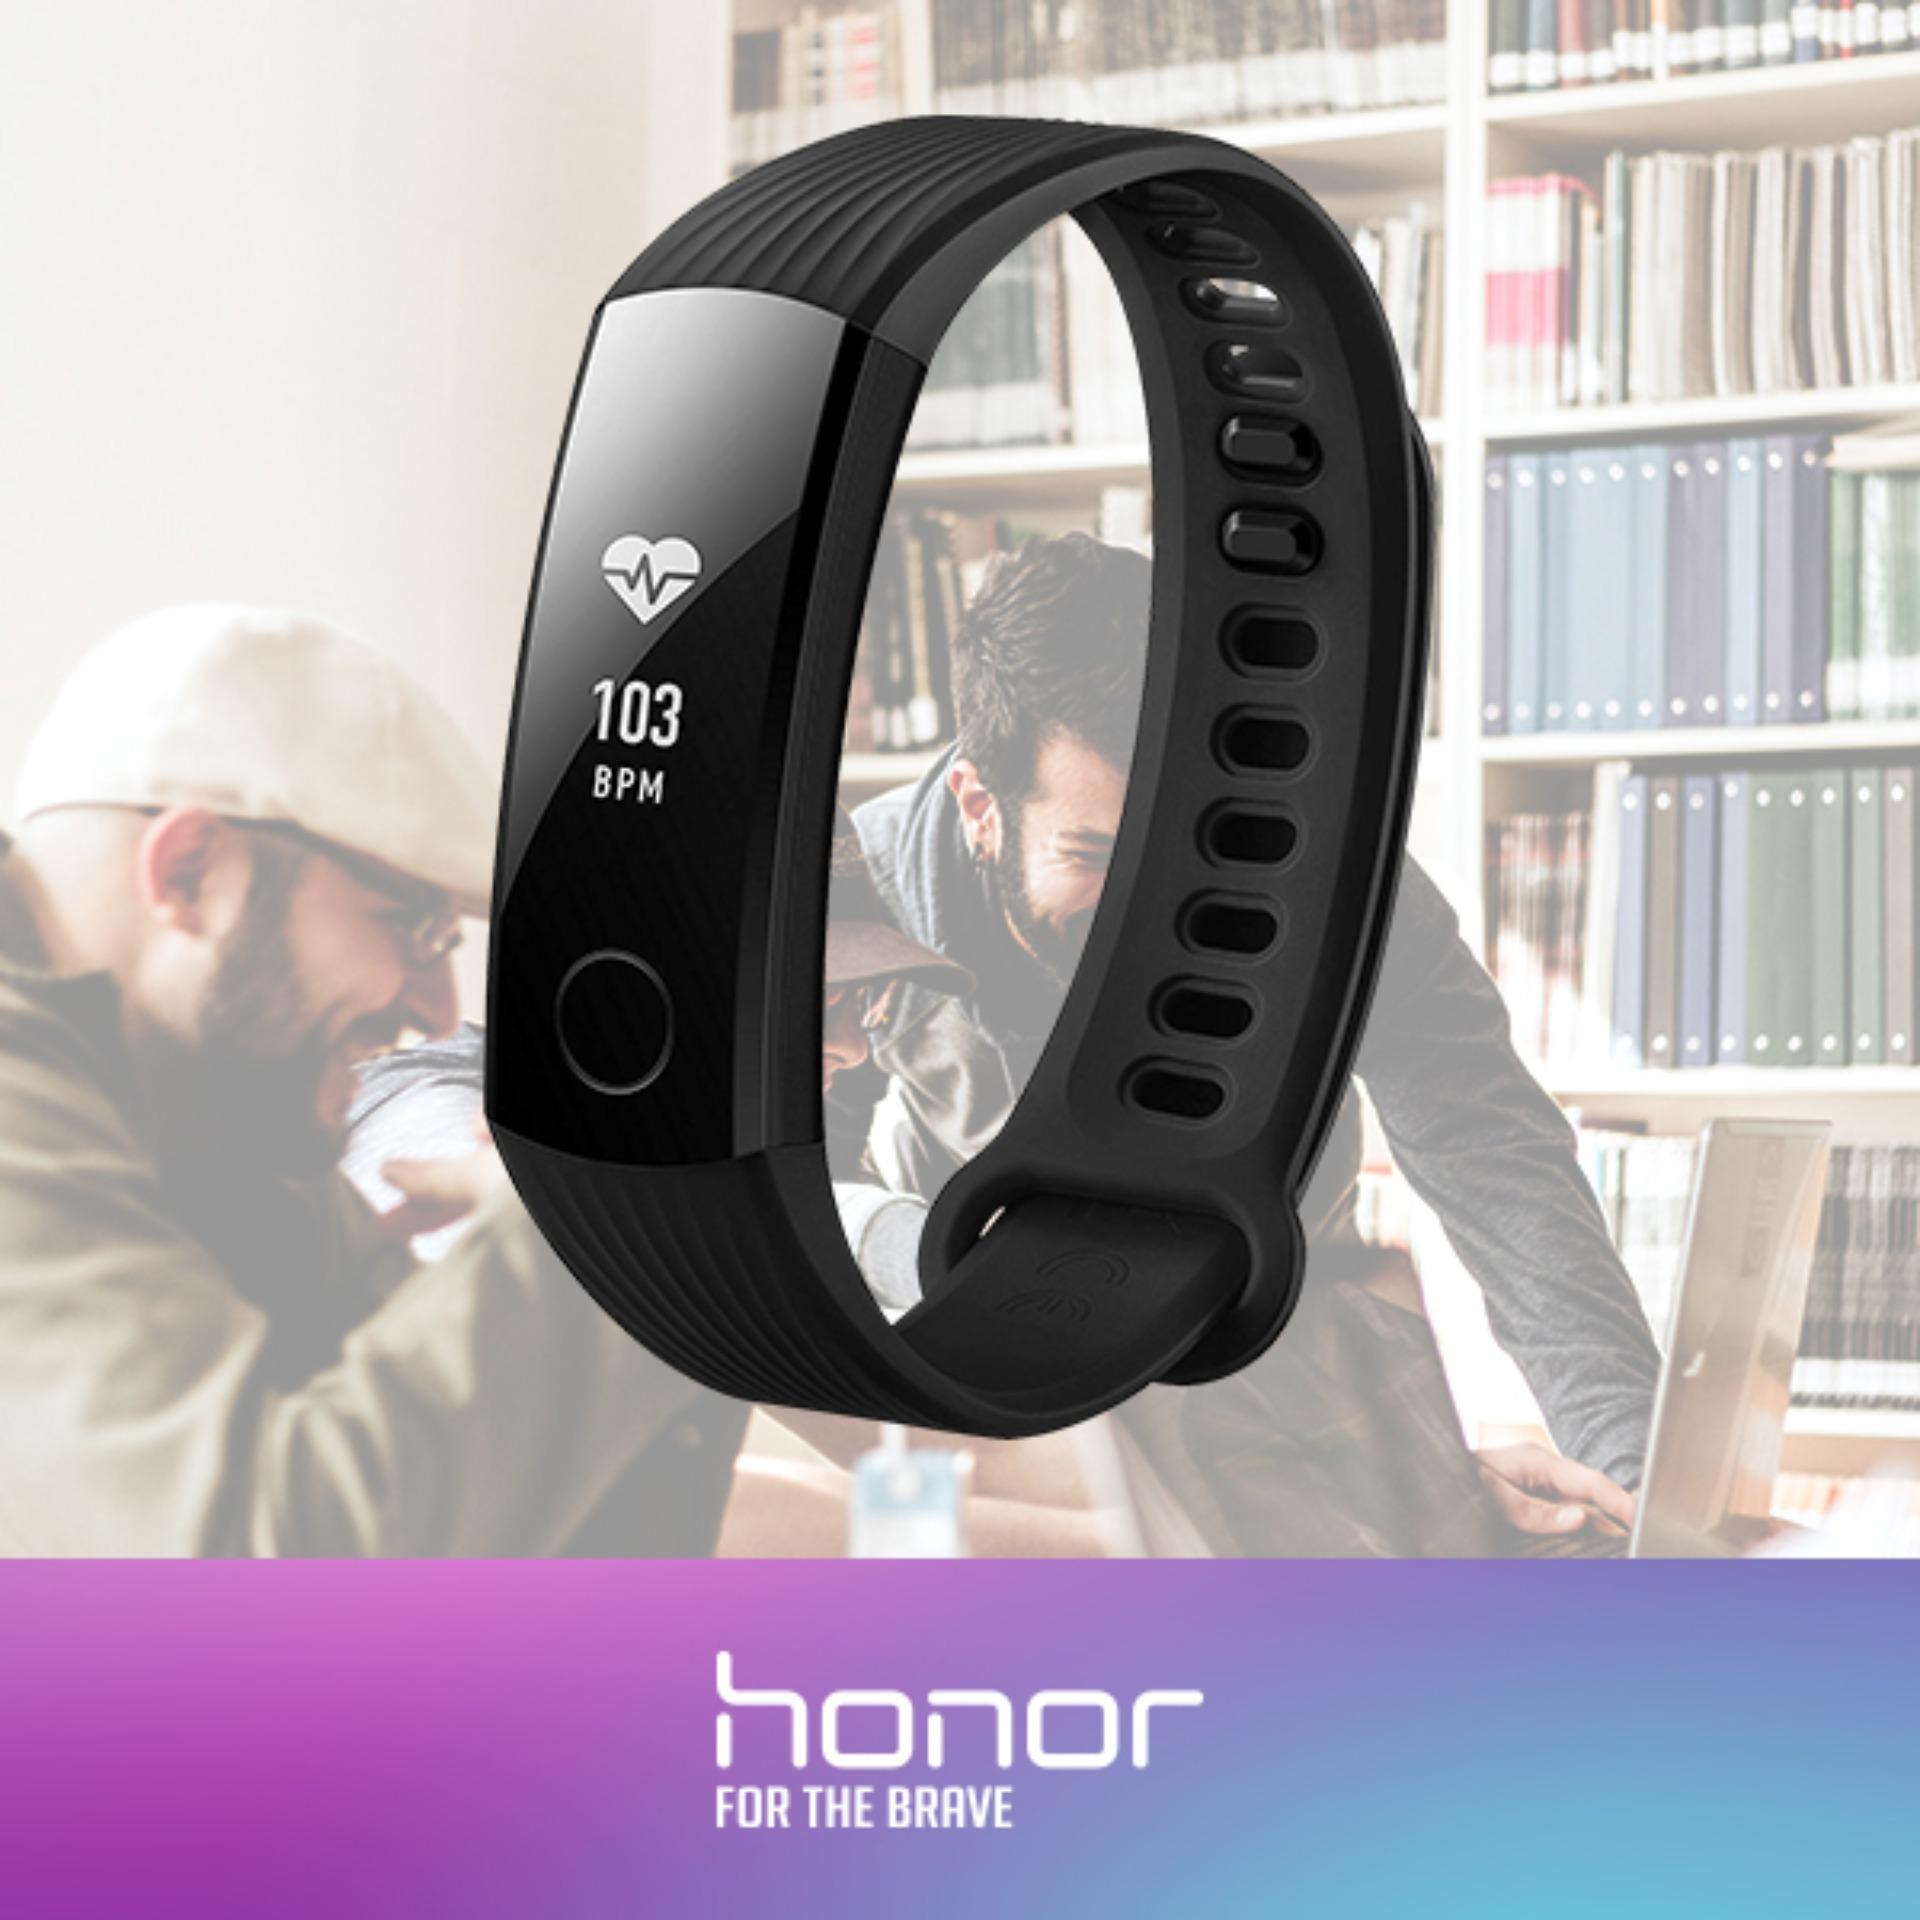 Jual Smartwatch Terbaru Onix A1 U10 Full Black Honor 3